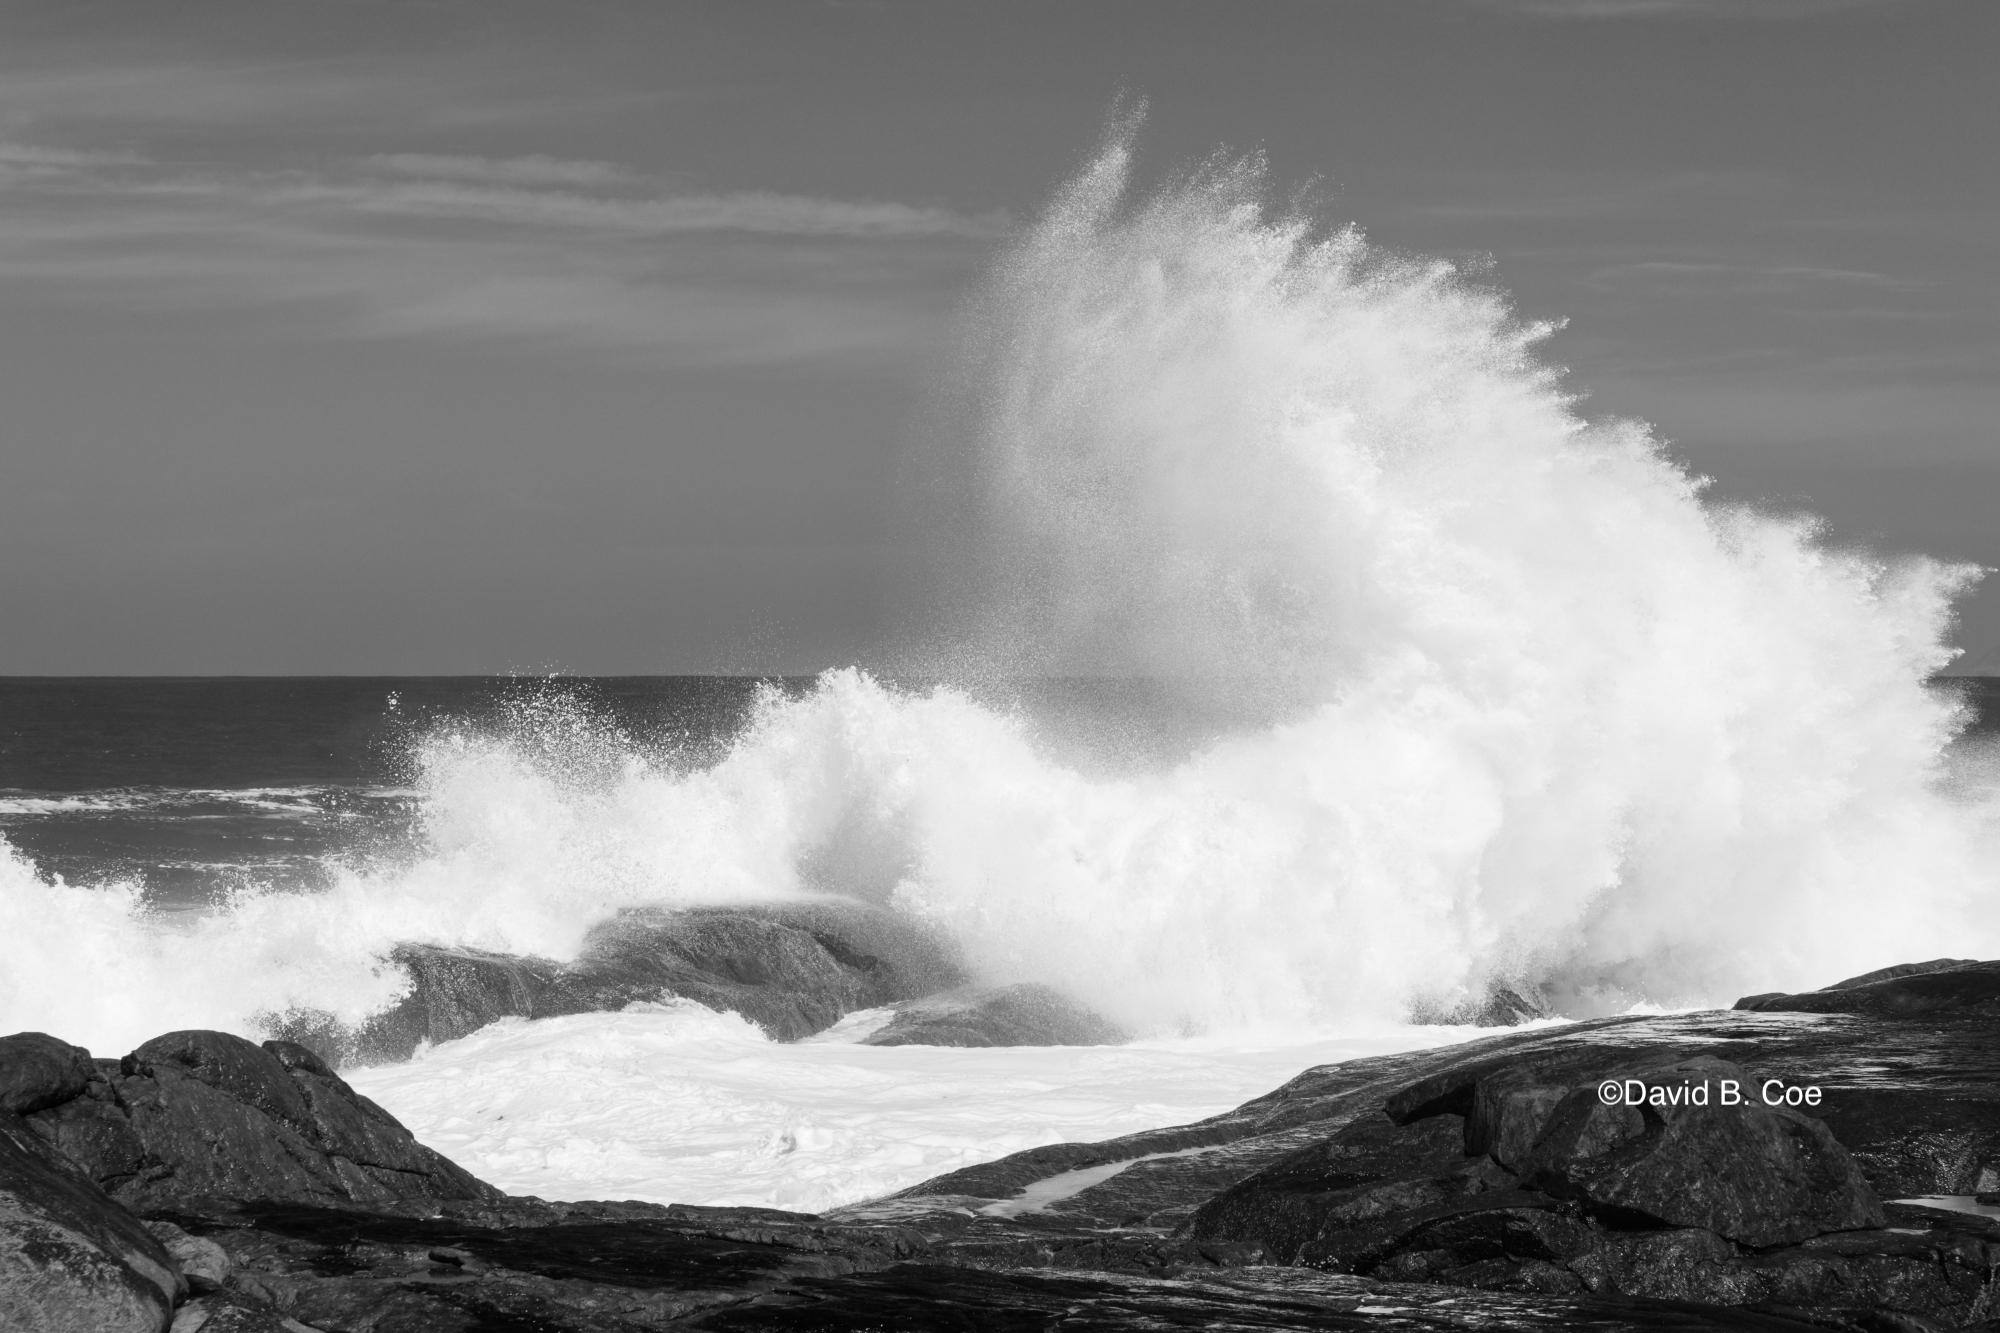 """Innes Coast Breaker"" by David B. Coe"